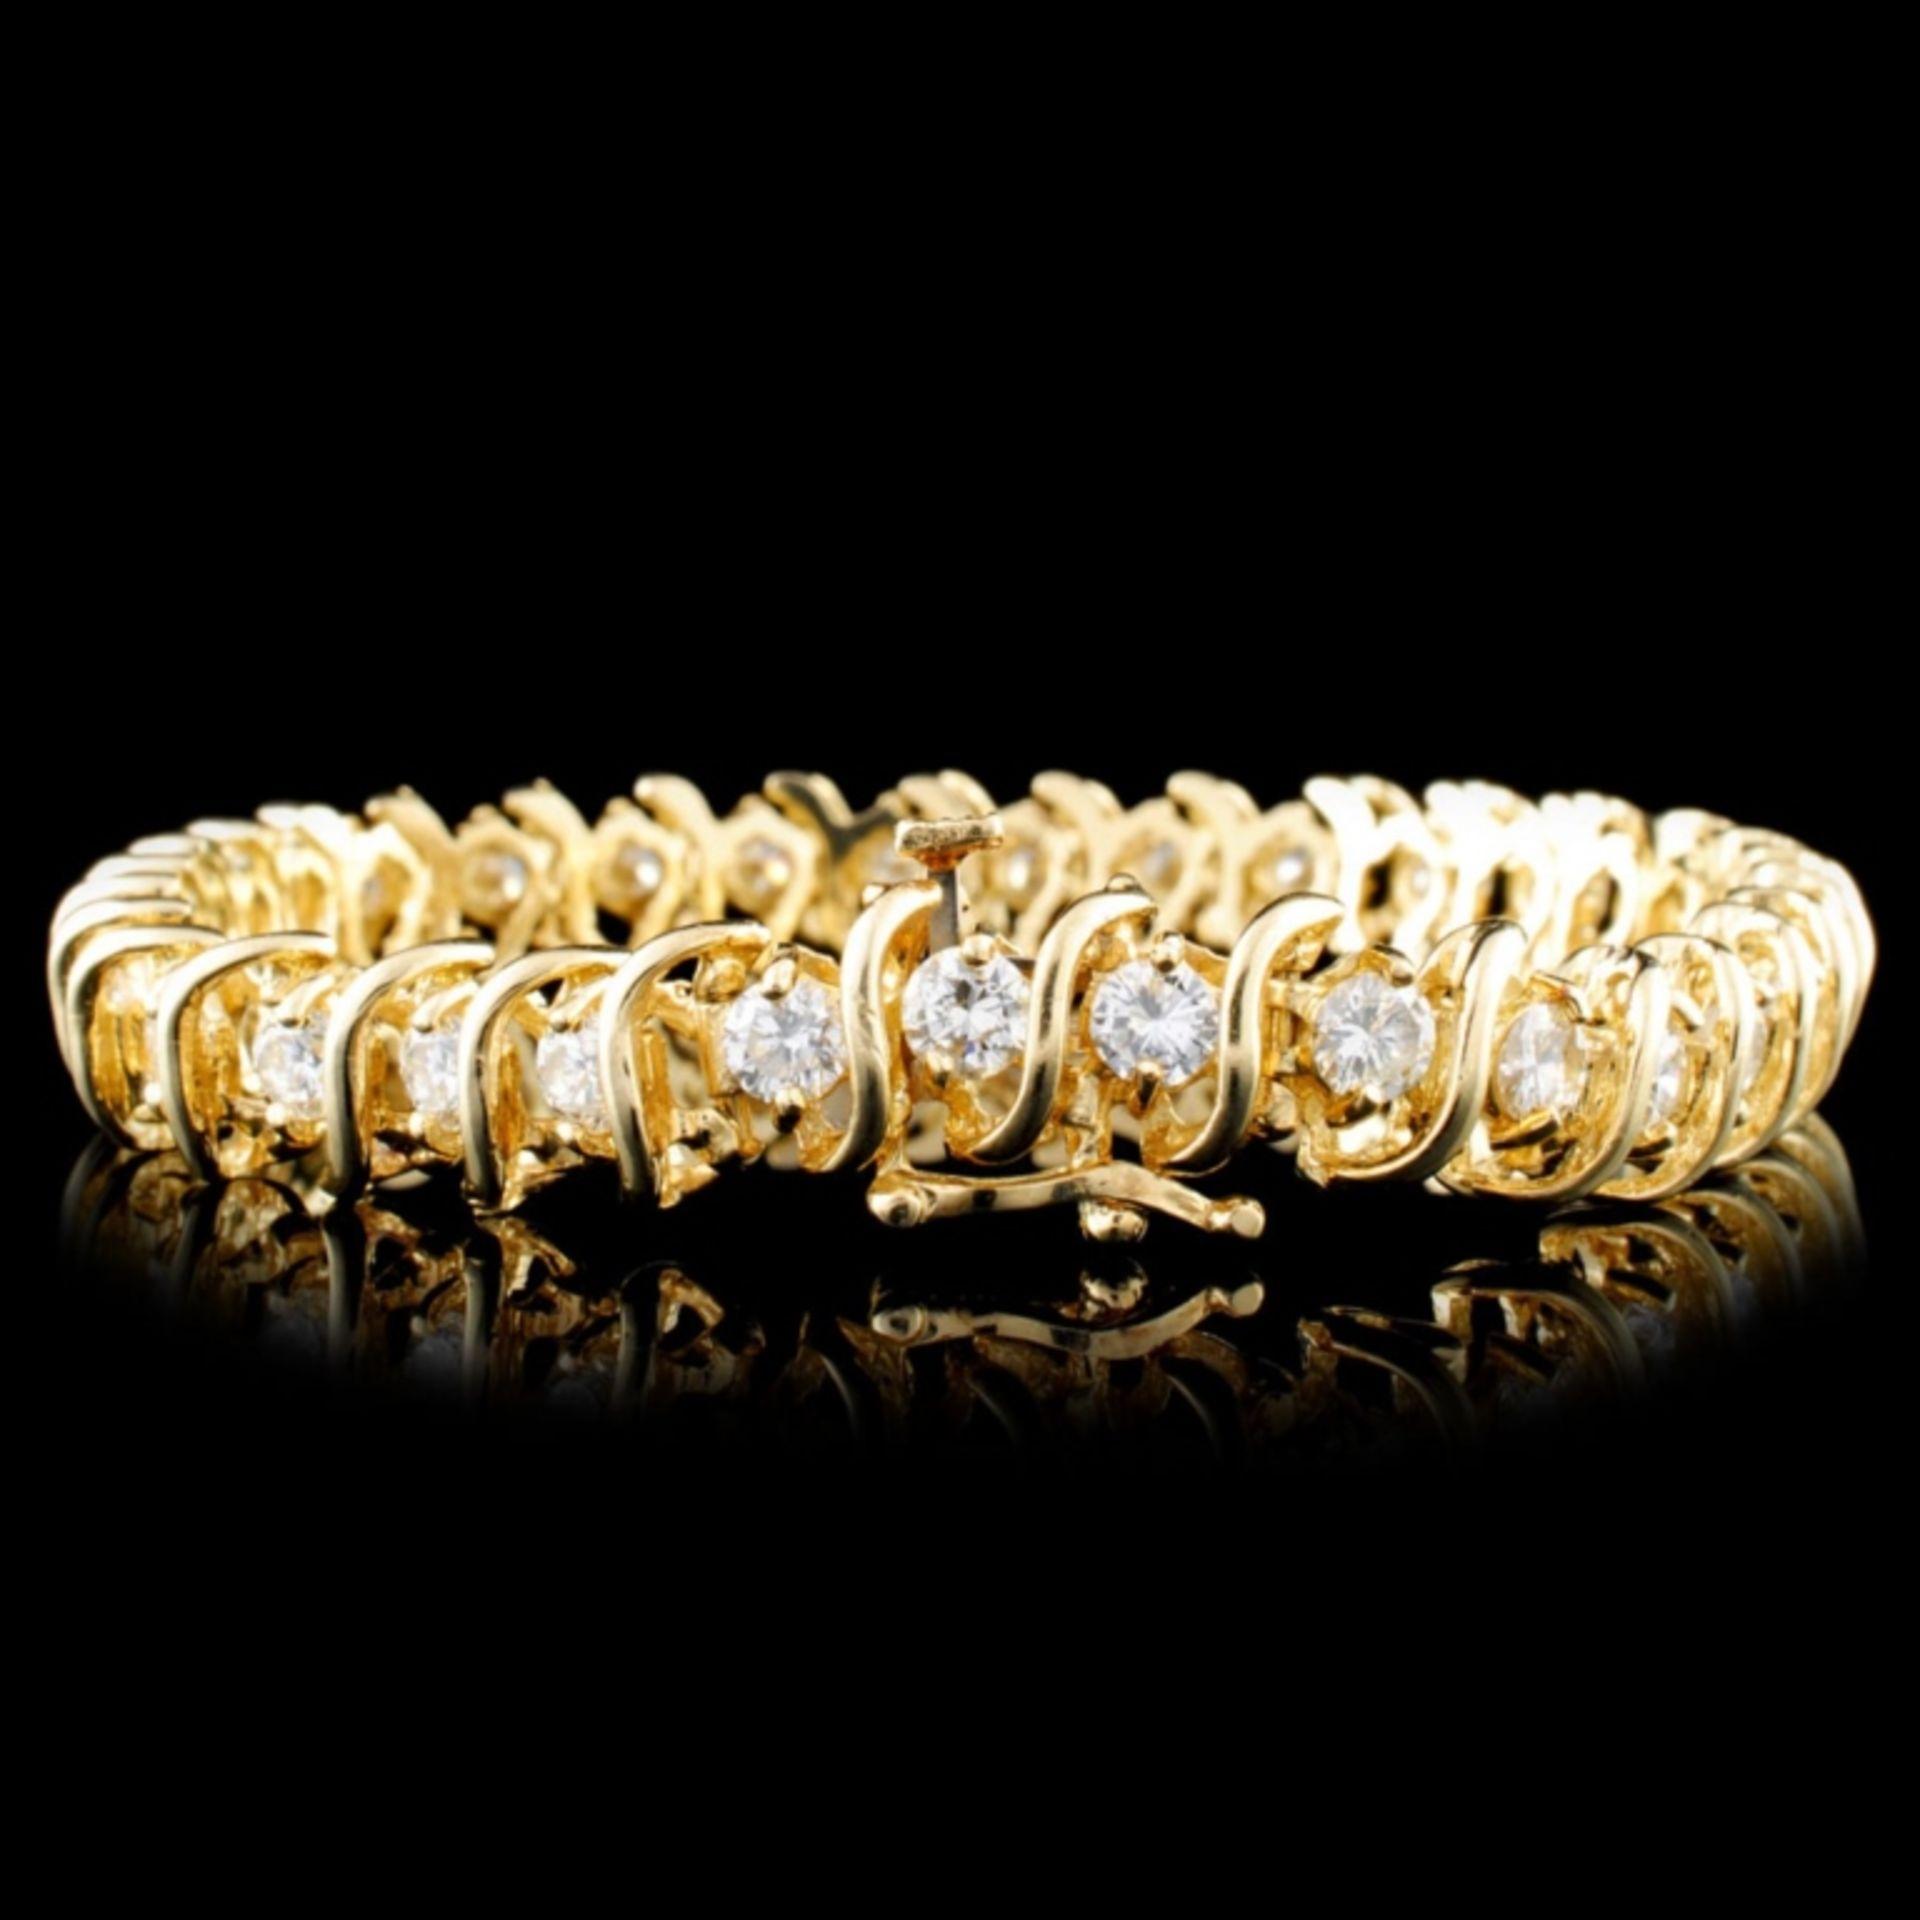 14K Gold 6.00ctw Diamond Bracelet - Image 2 of 4